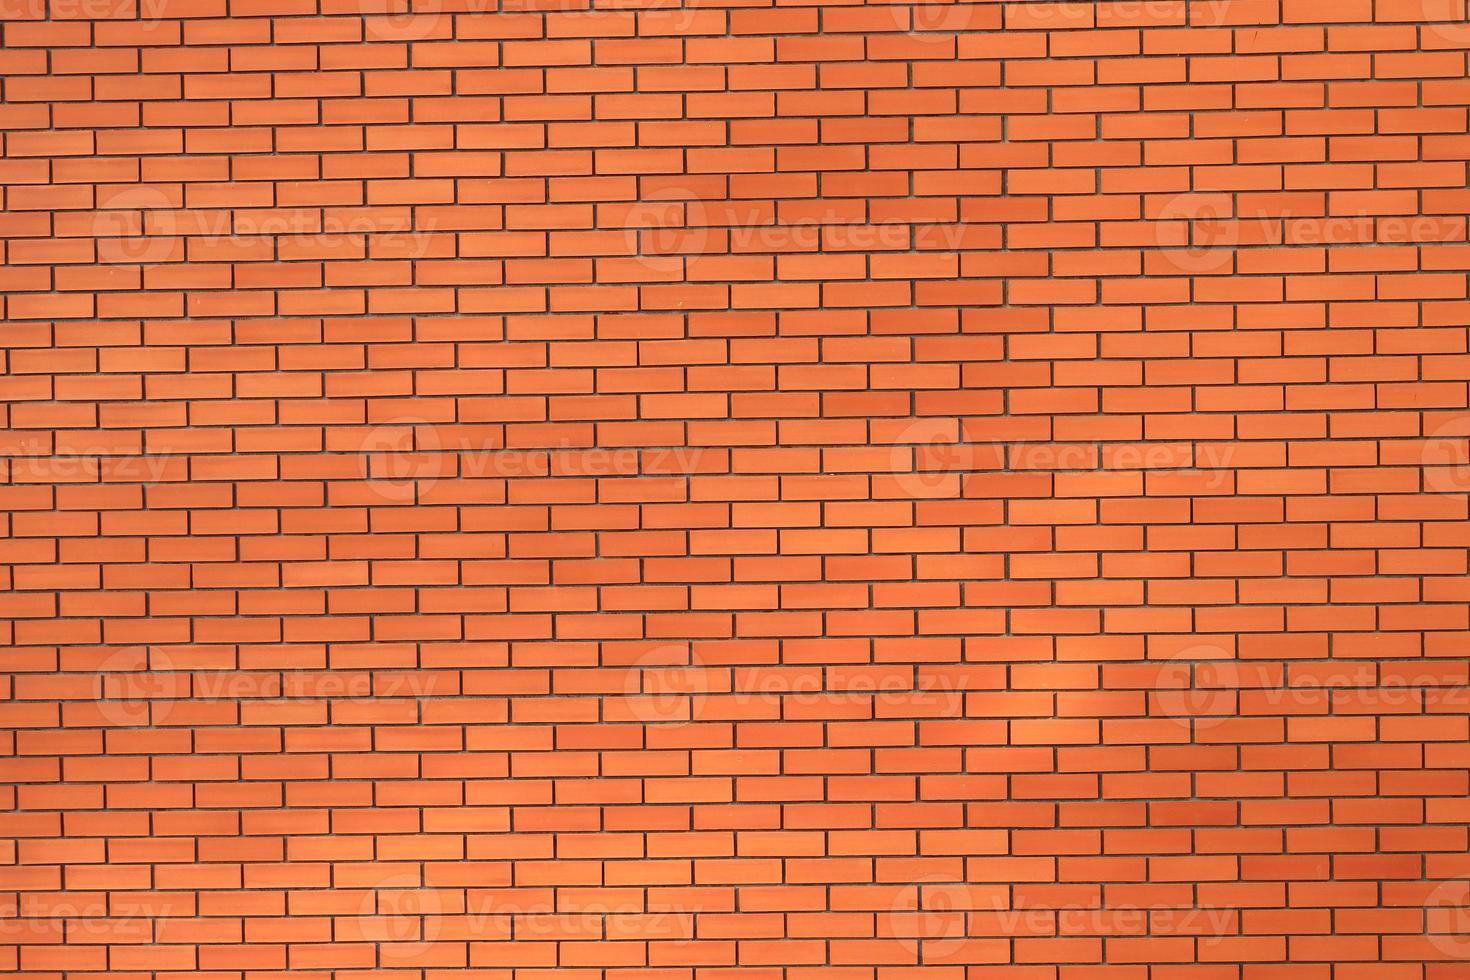 textura de couro de concreto laranja para o fundo foto